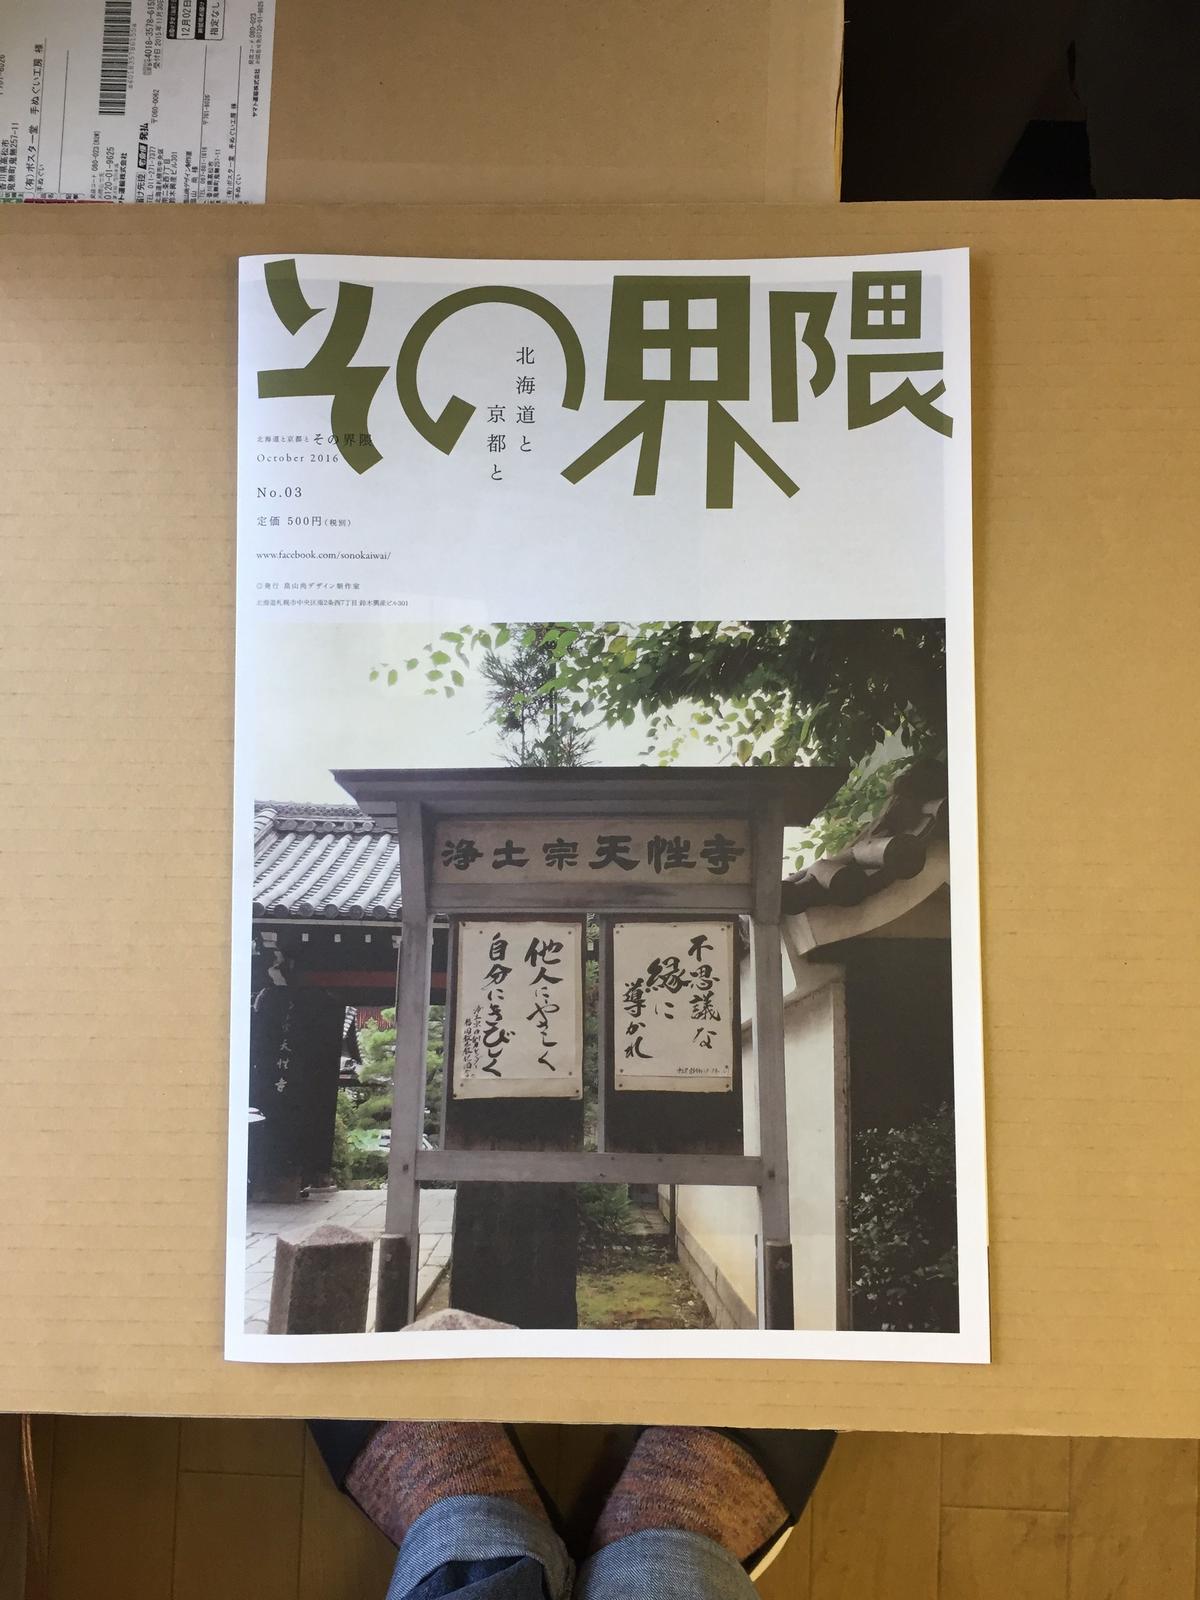 ng-non-bindable>北海道と京都と その界隈 第3号 | HH DESIGN